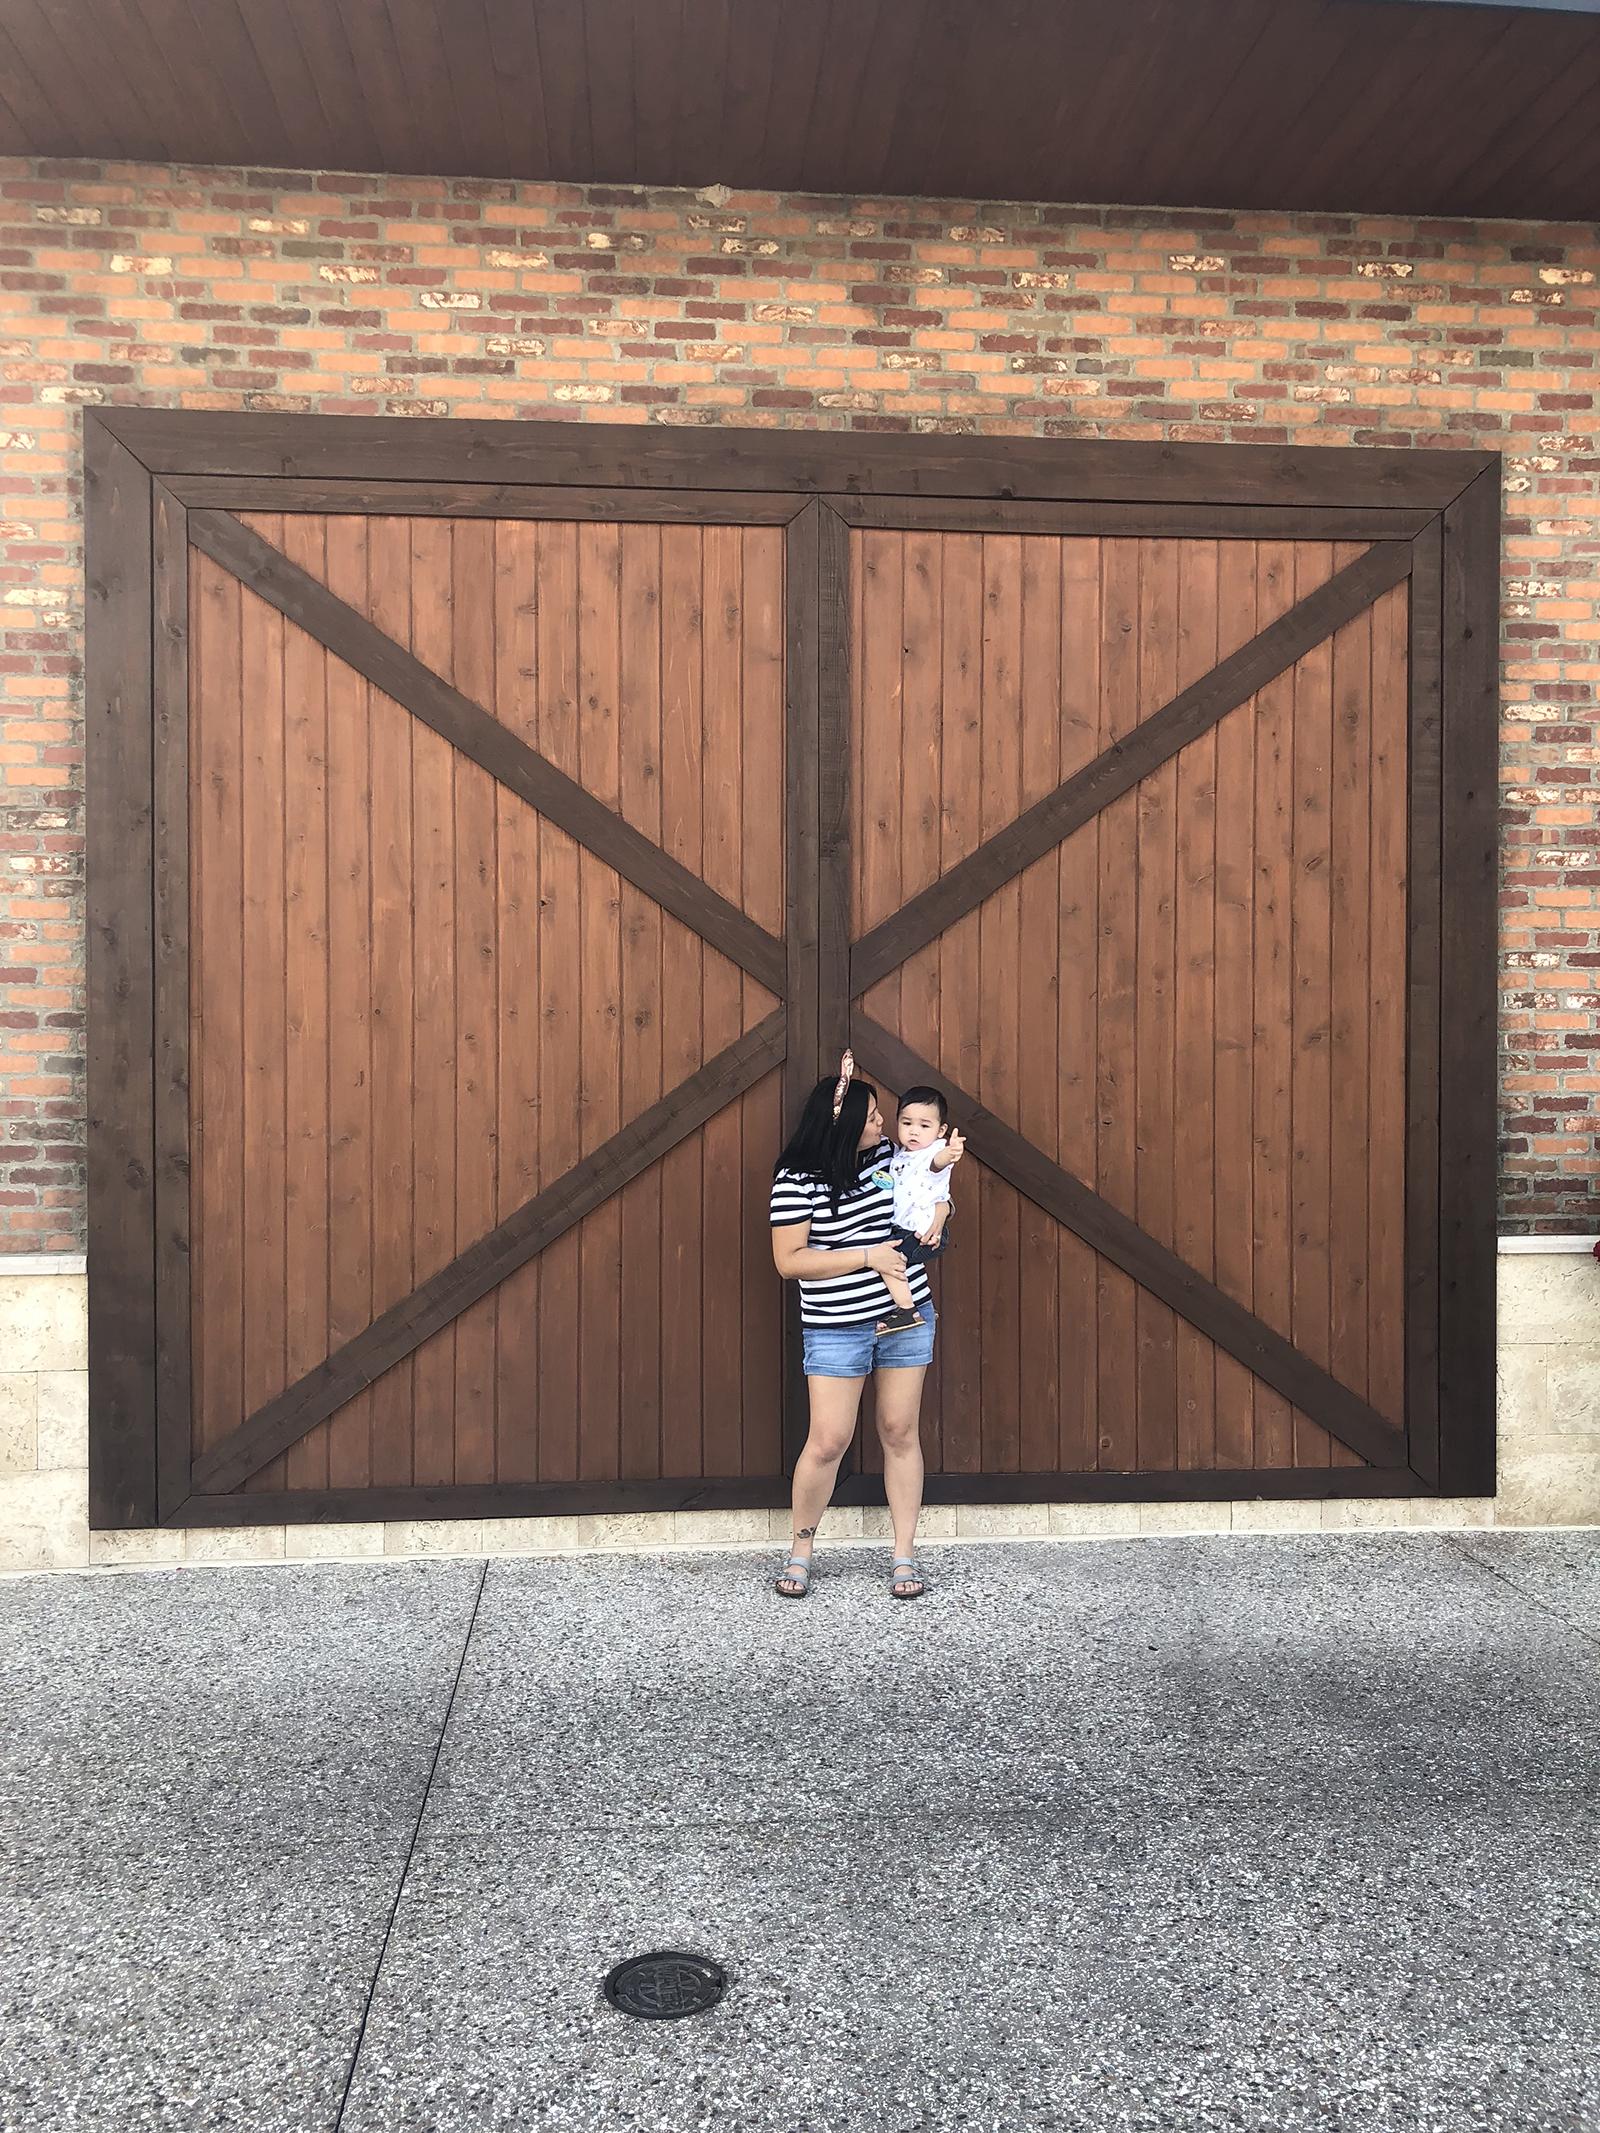 Disney Instagram-Worthy Walls: Your Next Best Photo Opp